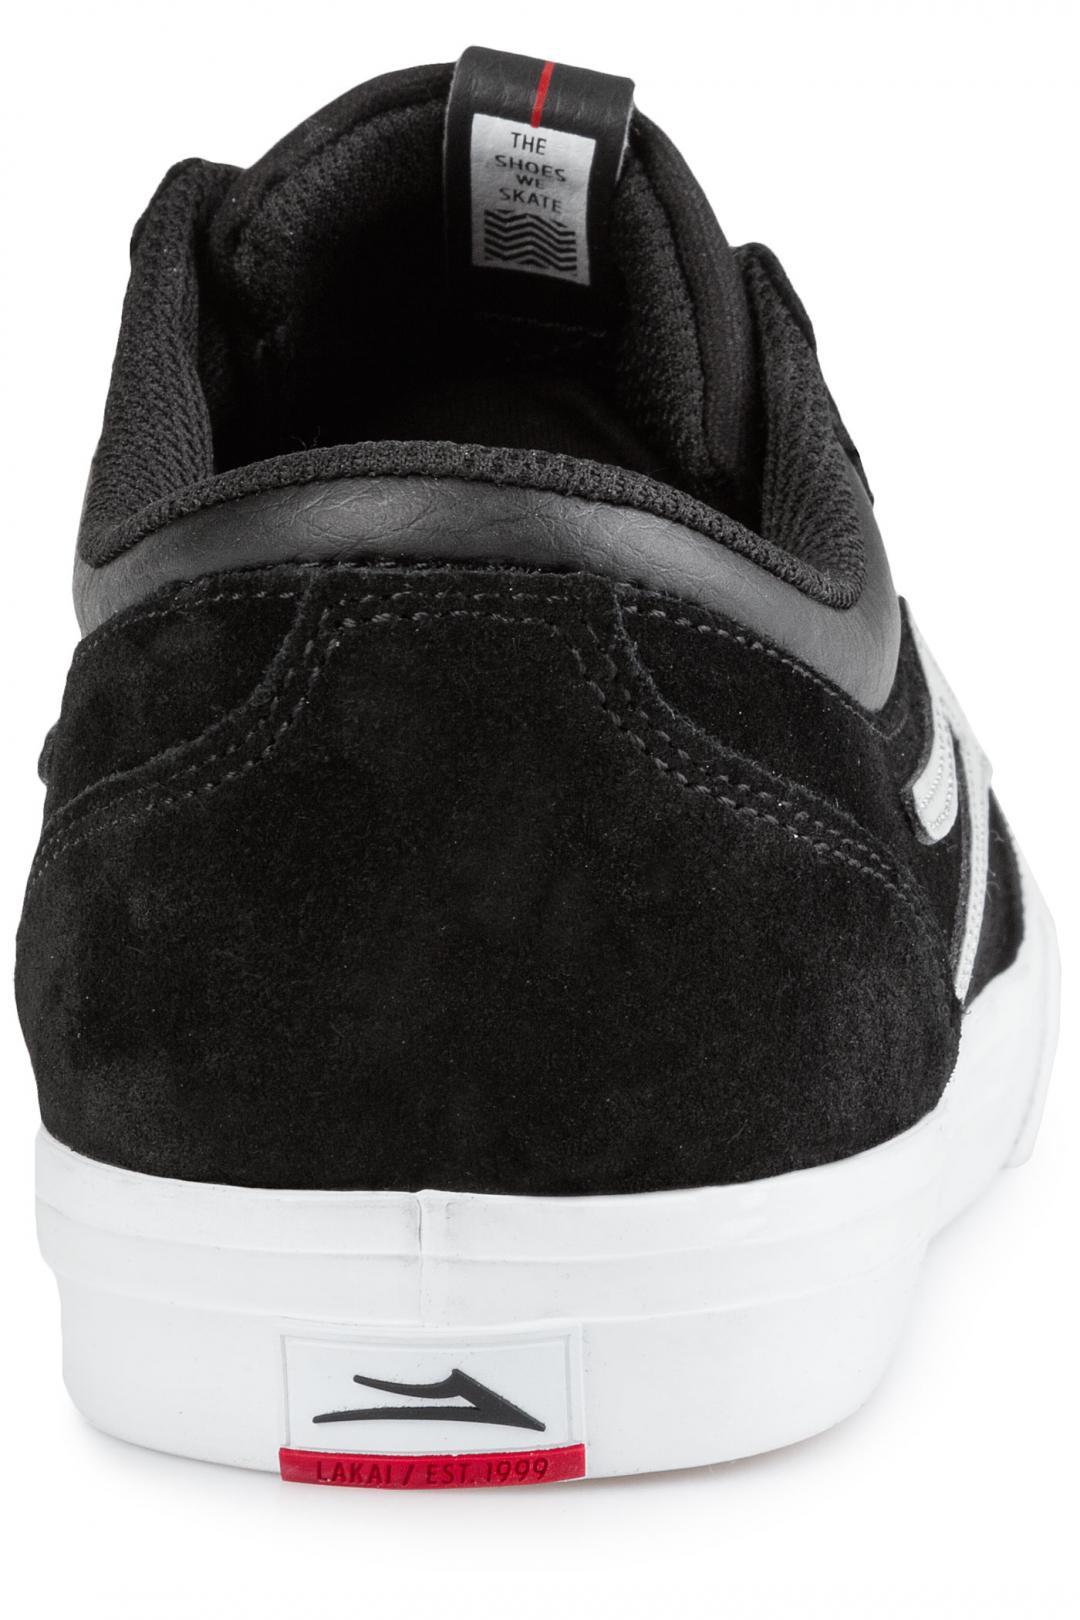 Uomo Lakai Griffin Suede black reflective | Scarpe da skate